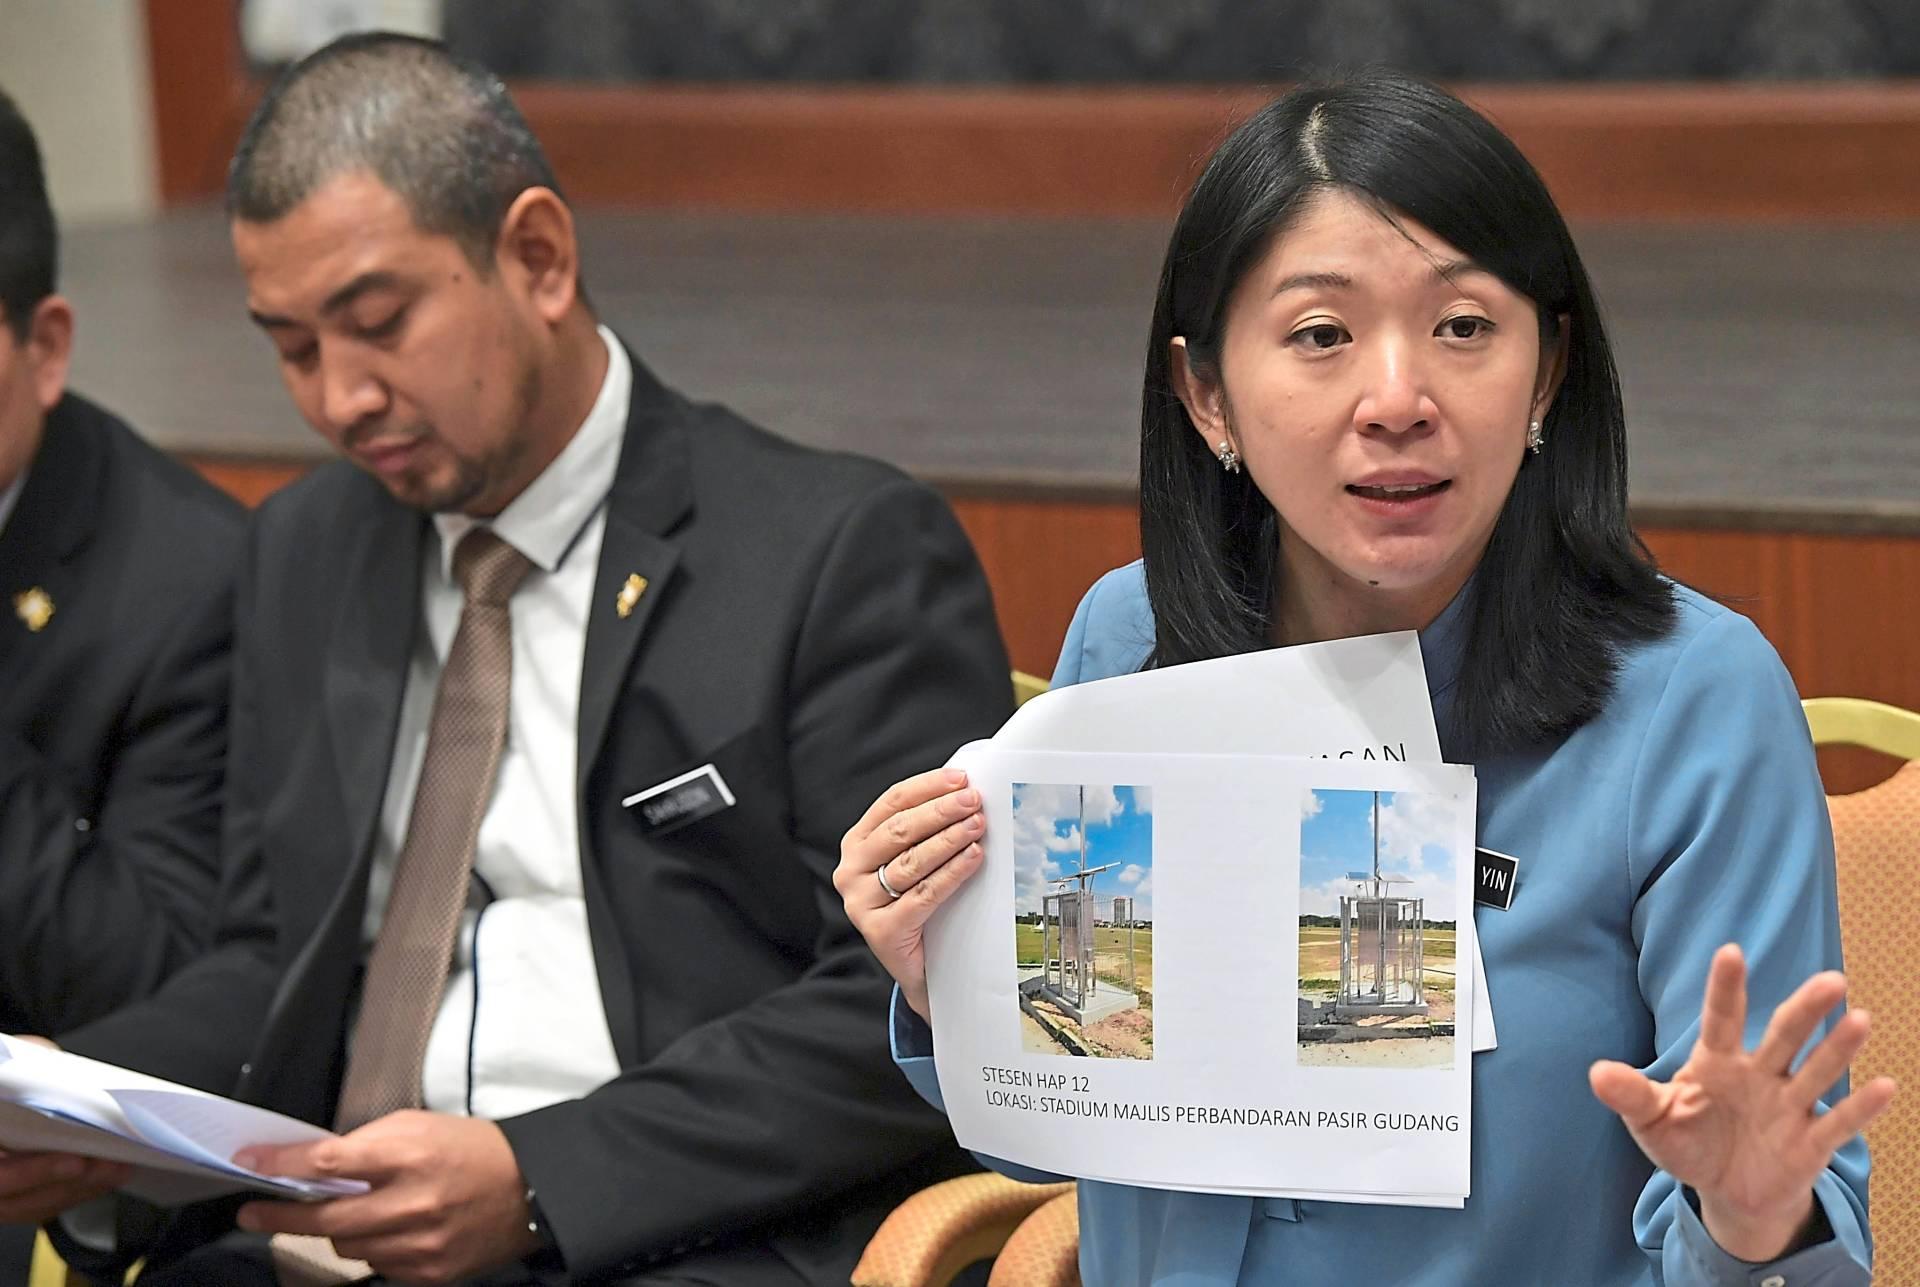 Govt instals automatic gas detectors in Pasir Gudang